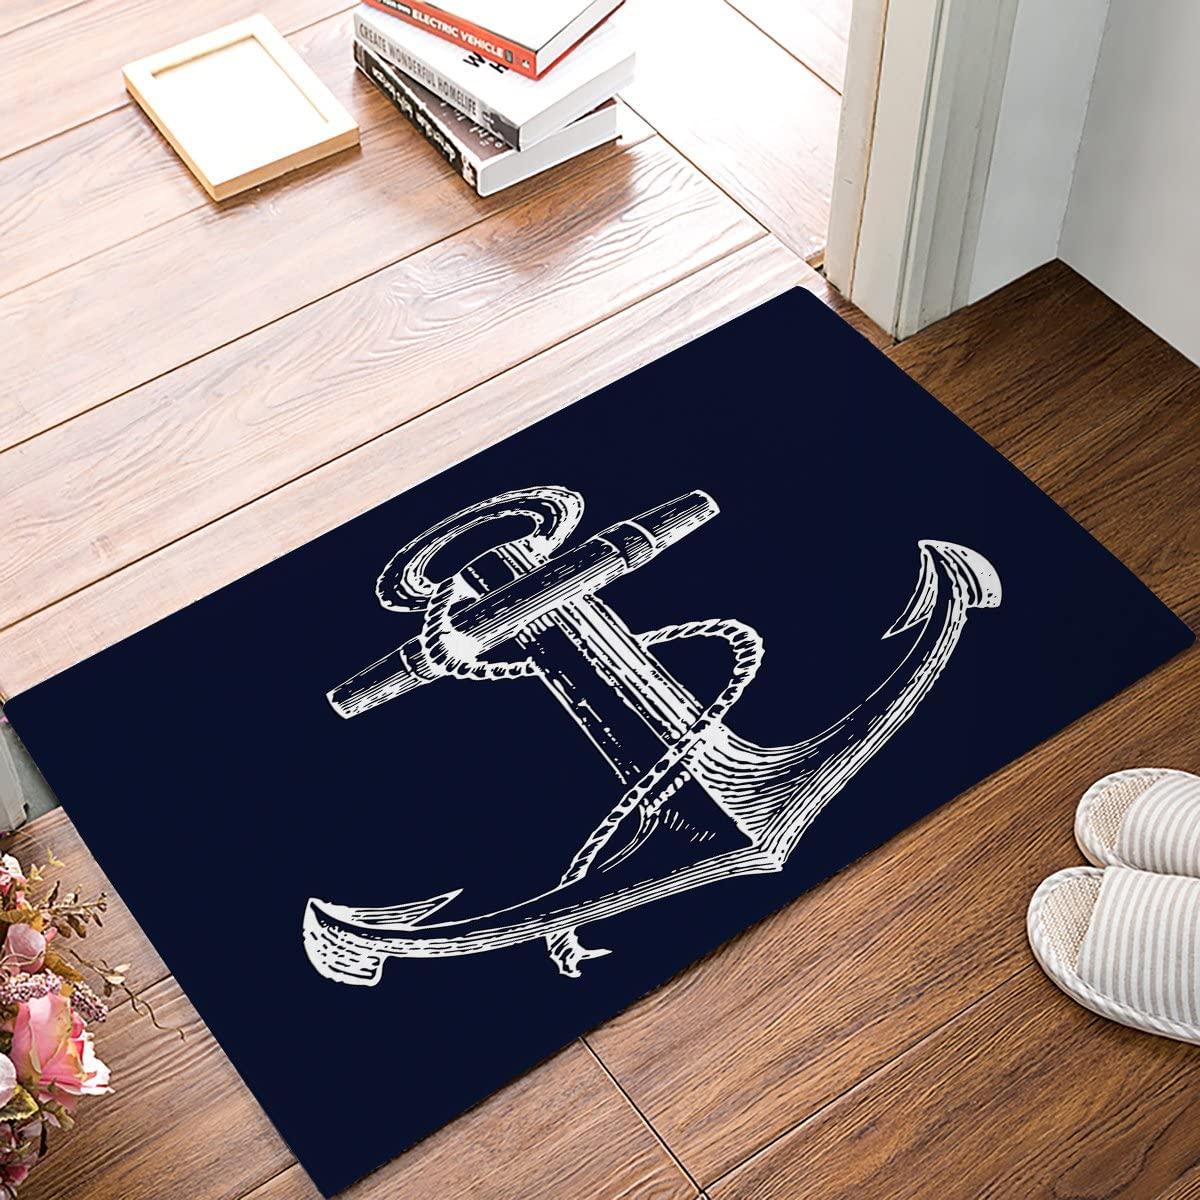 White Nautical Anchor Navy Blue Door Mats Cover Non-Slip Machine Washable Indoor Bathroom Kitchen Decor Rug Mat Welcome Doormat 23.6x15.7inch